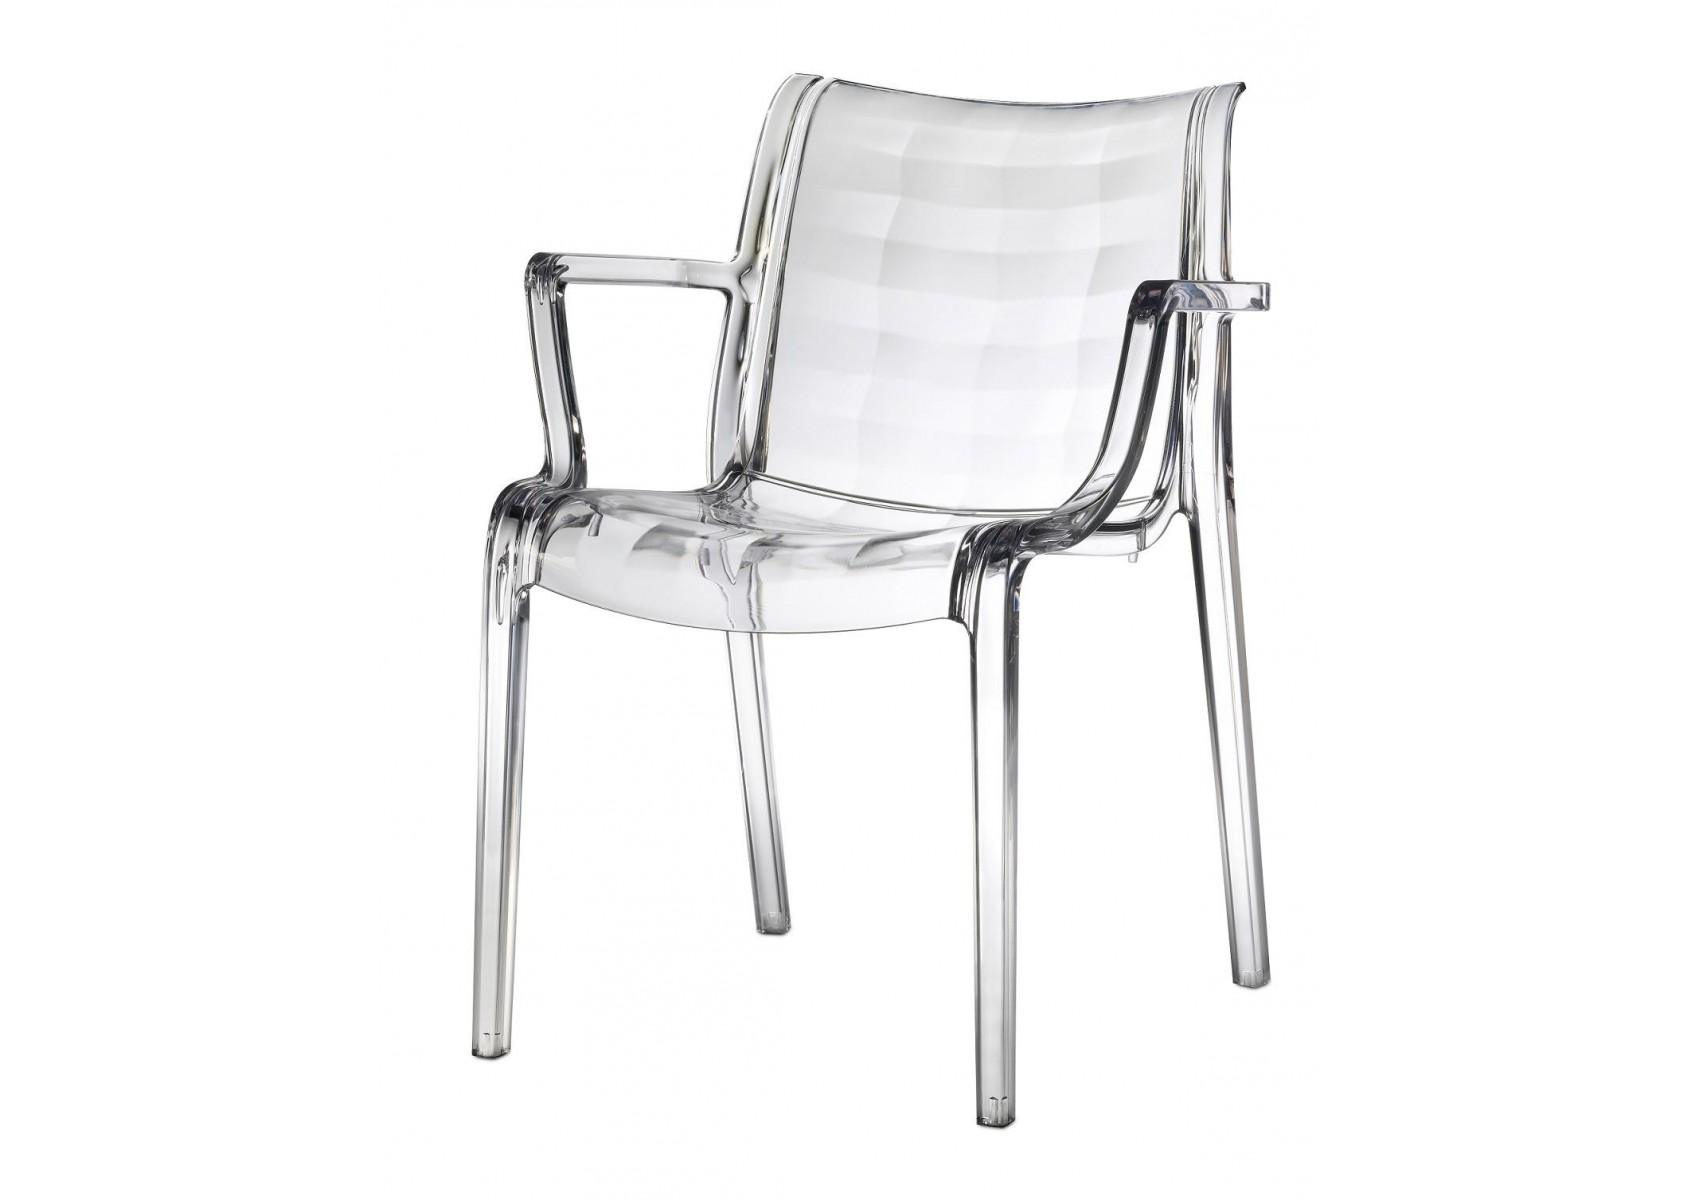 chaise transparente design extraodinaria transparente vendu lunit deco - Chaise Transparente